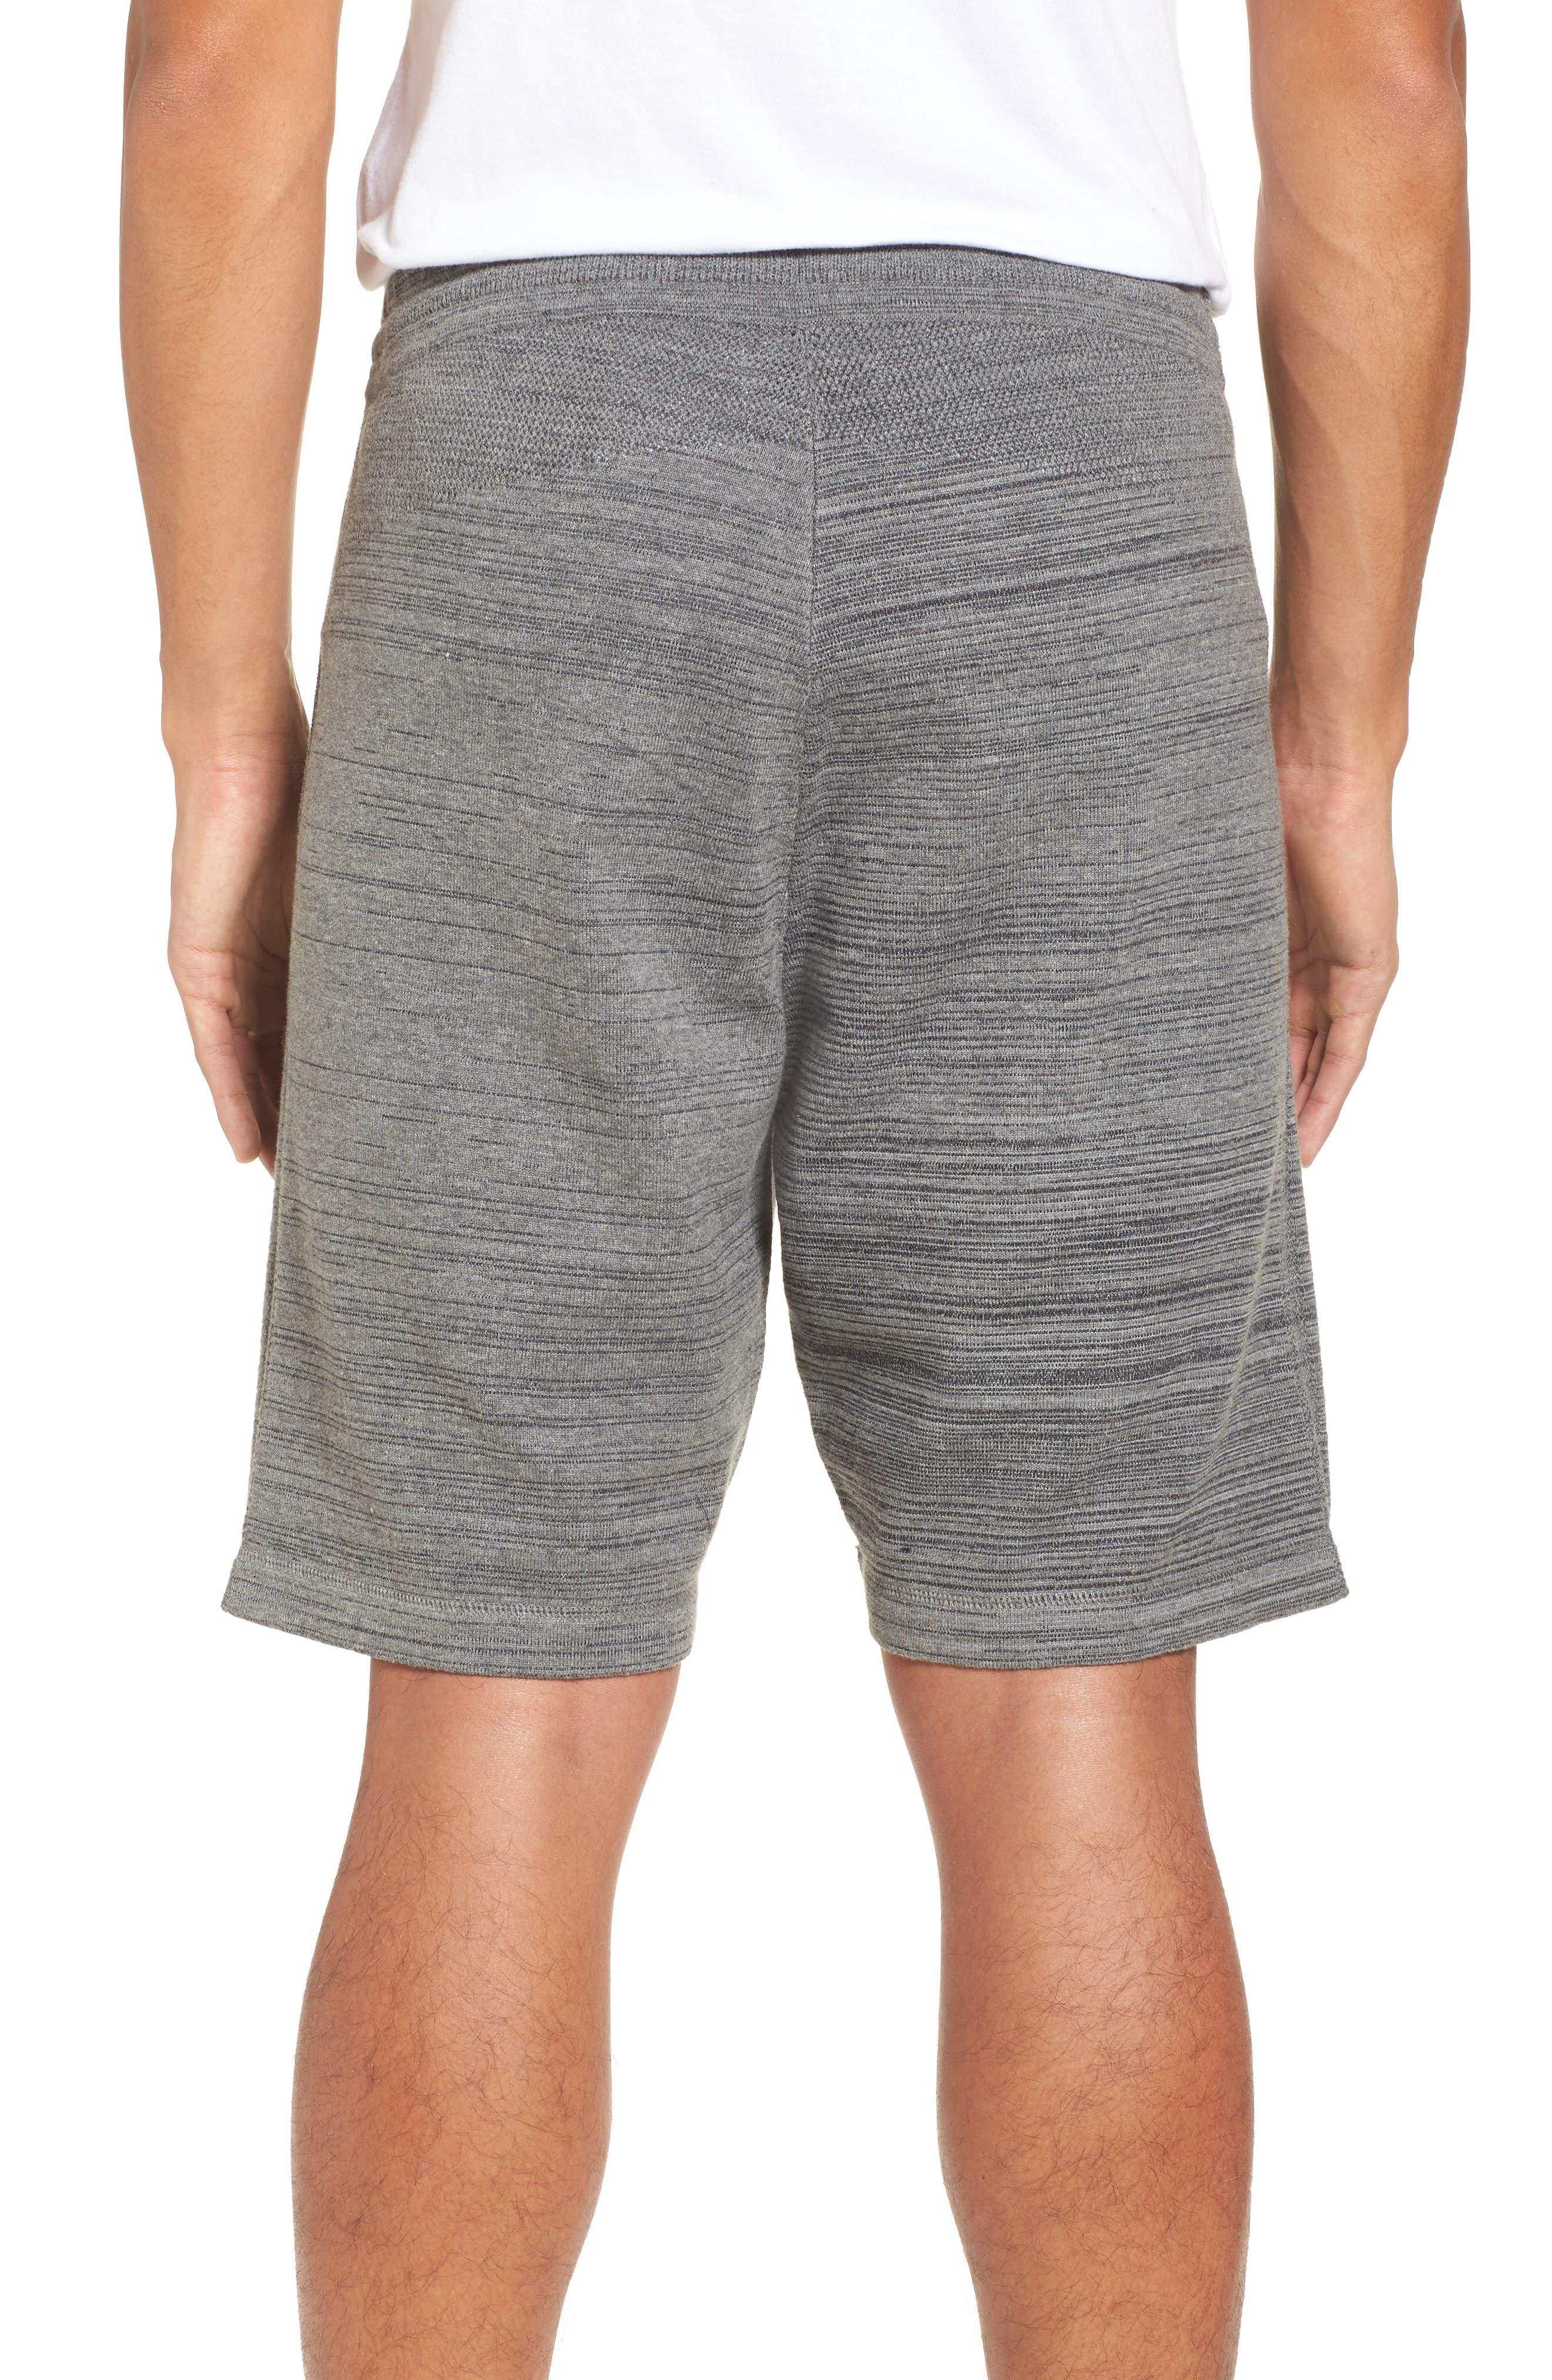 Tech Shorts,                             Alternate thumbnail 2, color,                             030